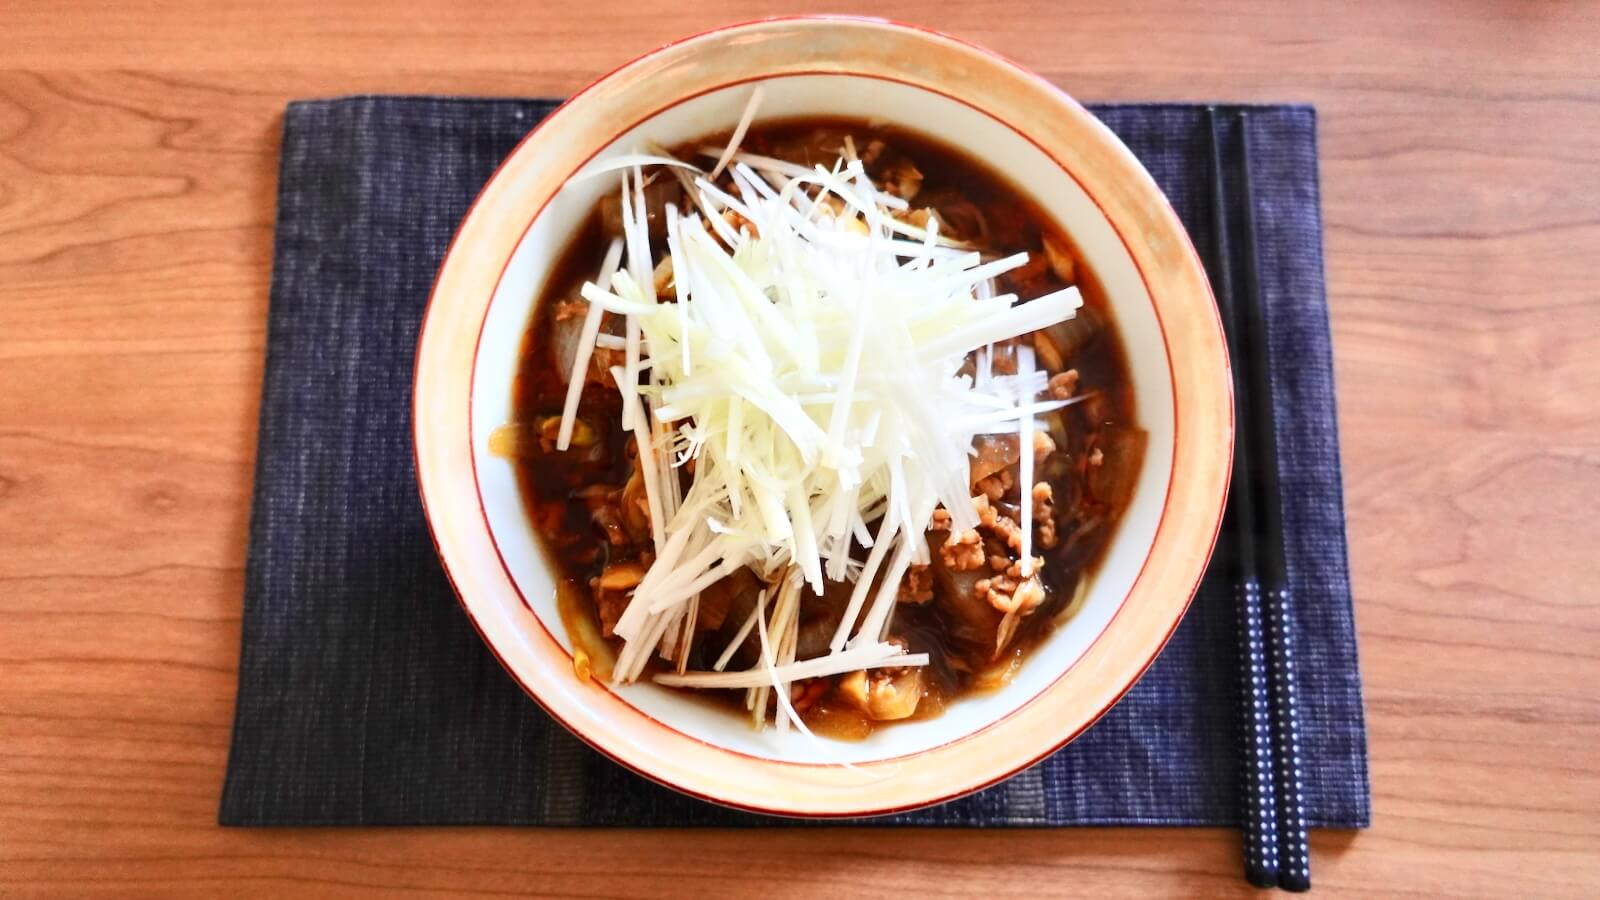 A photo of the Ezawa Katsuura Tantan noodles made from above